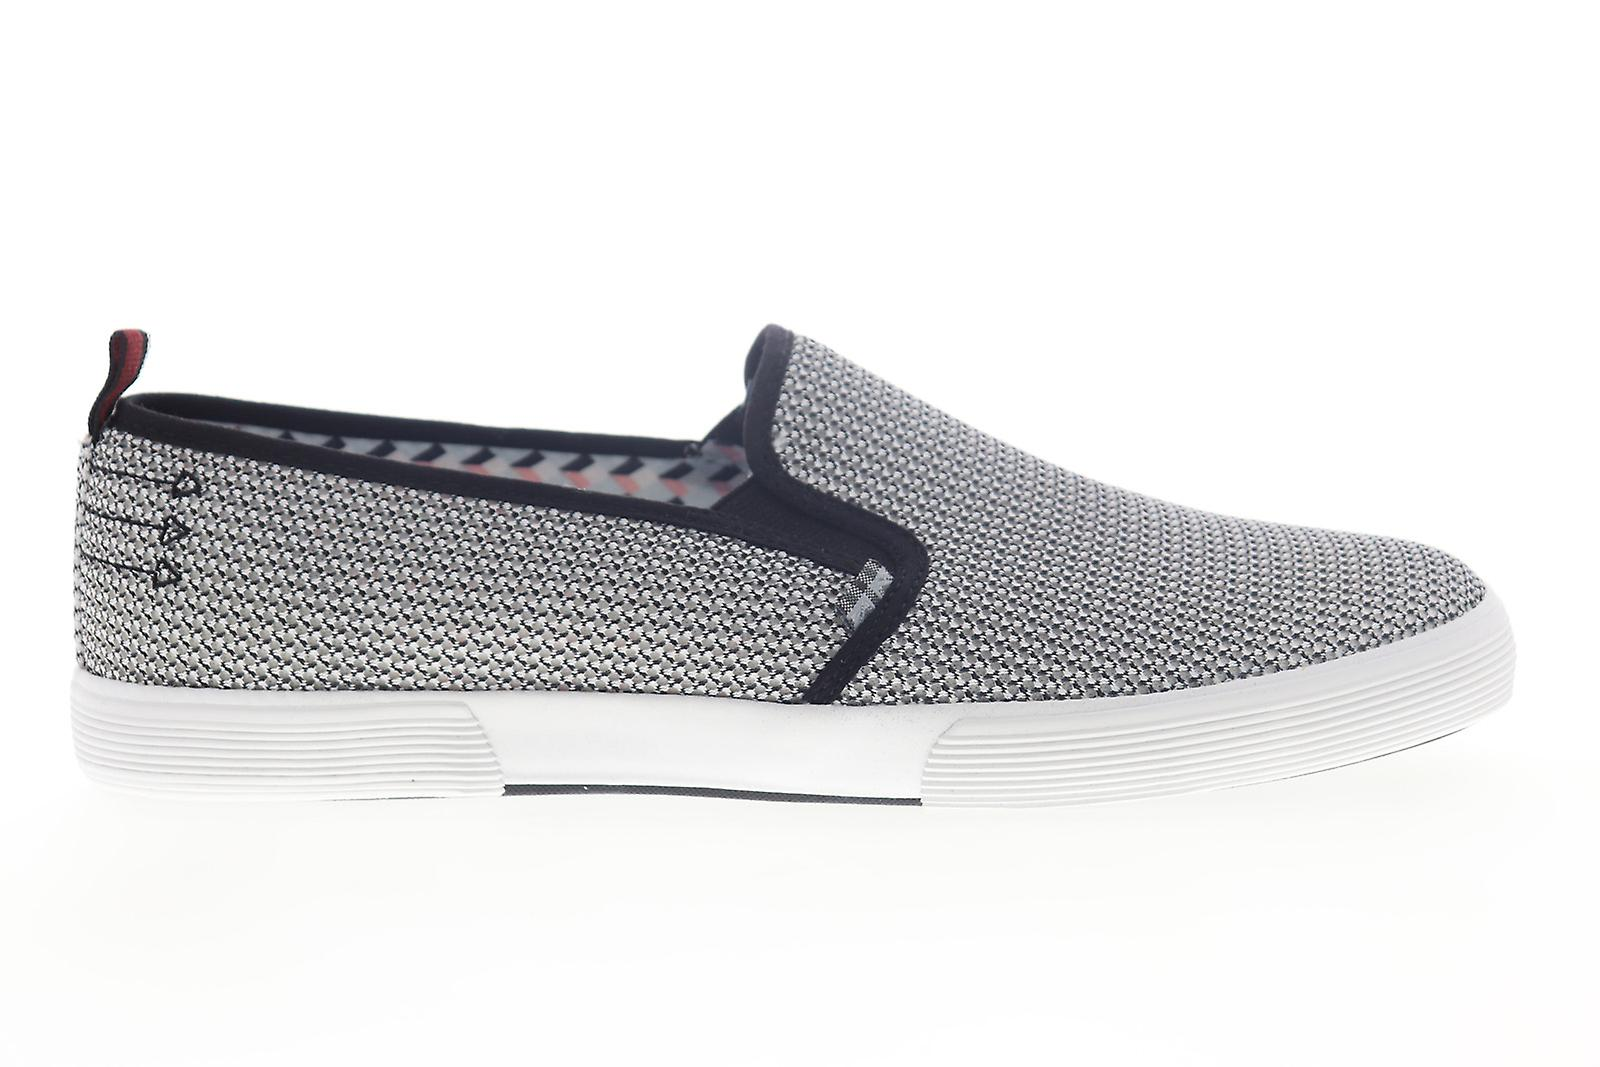 Ben Sherman Bristol Slip On Mens Black Mesh Sneakers Chaussures